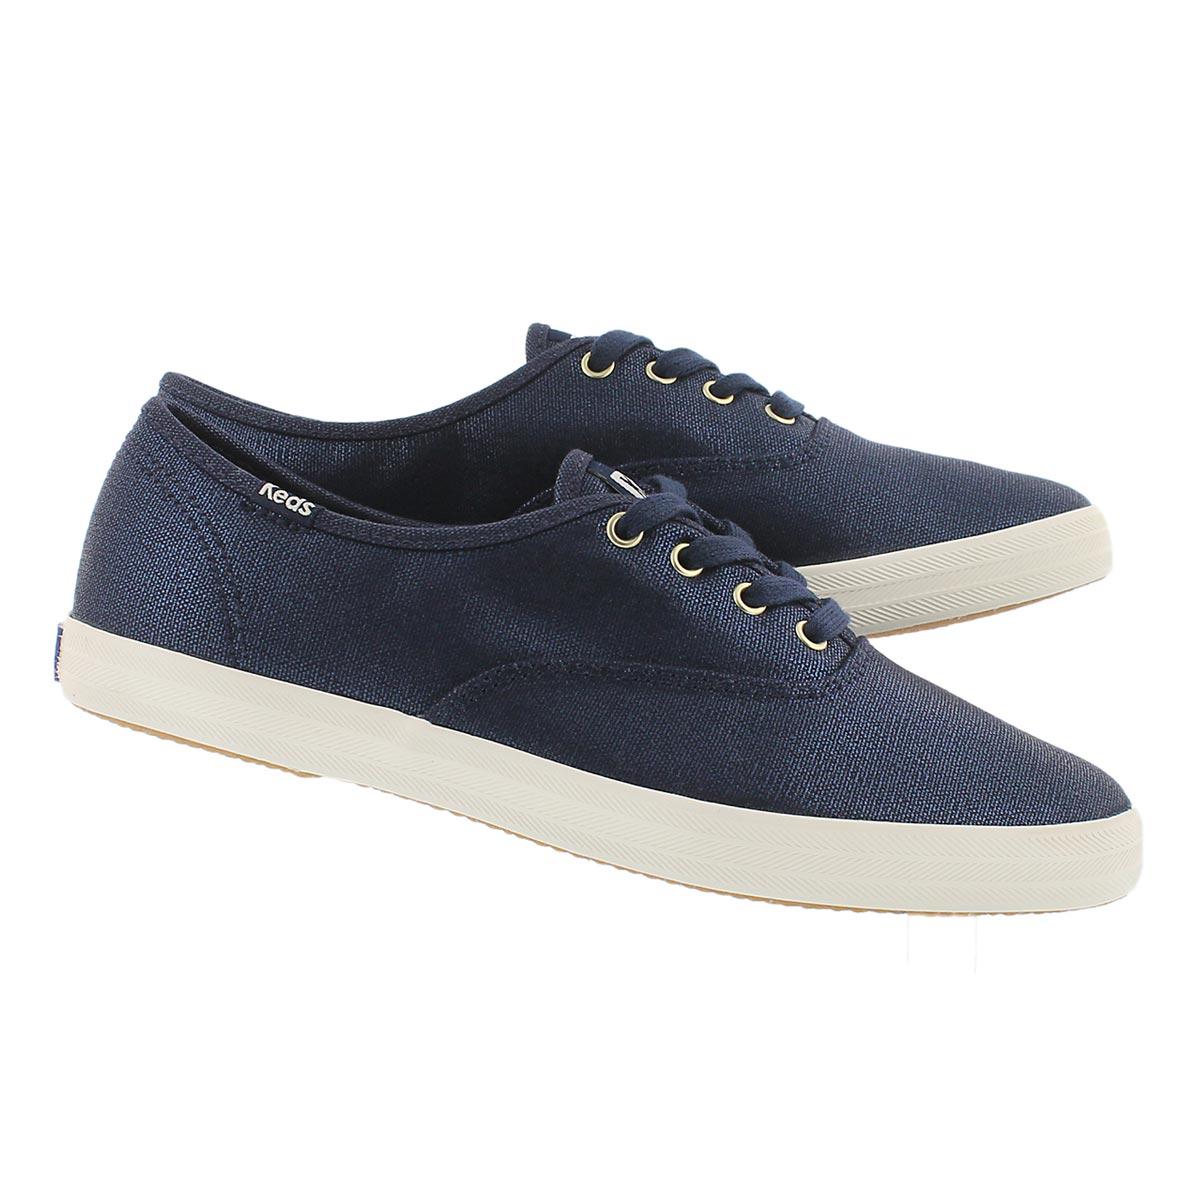 Lds Champion navy metallic sneaker